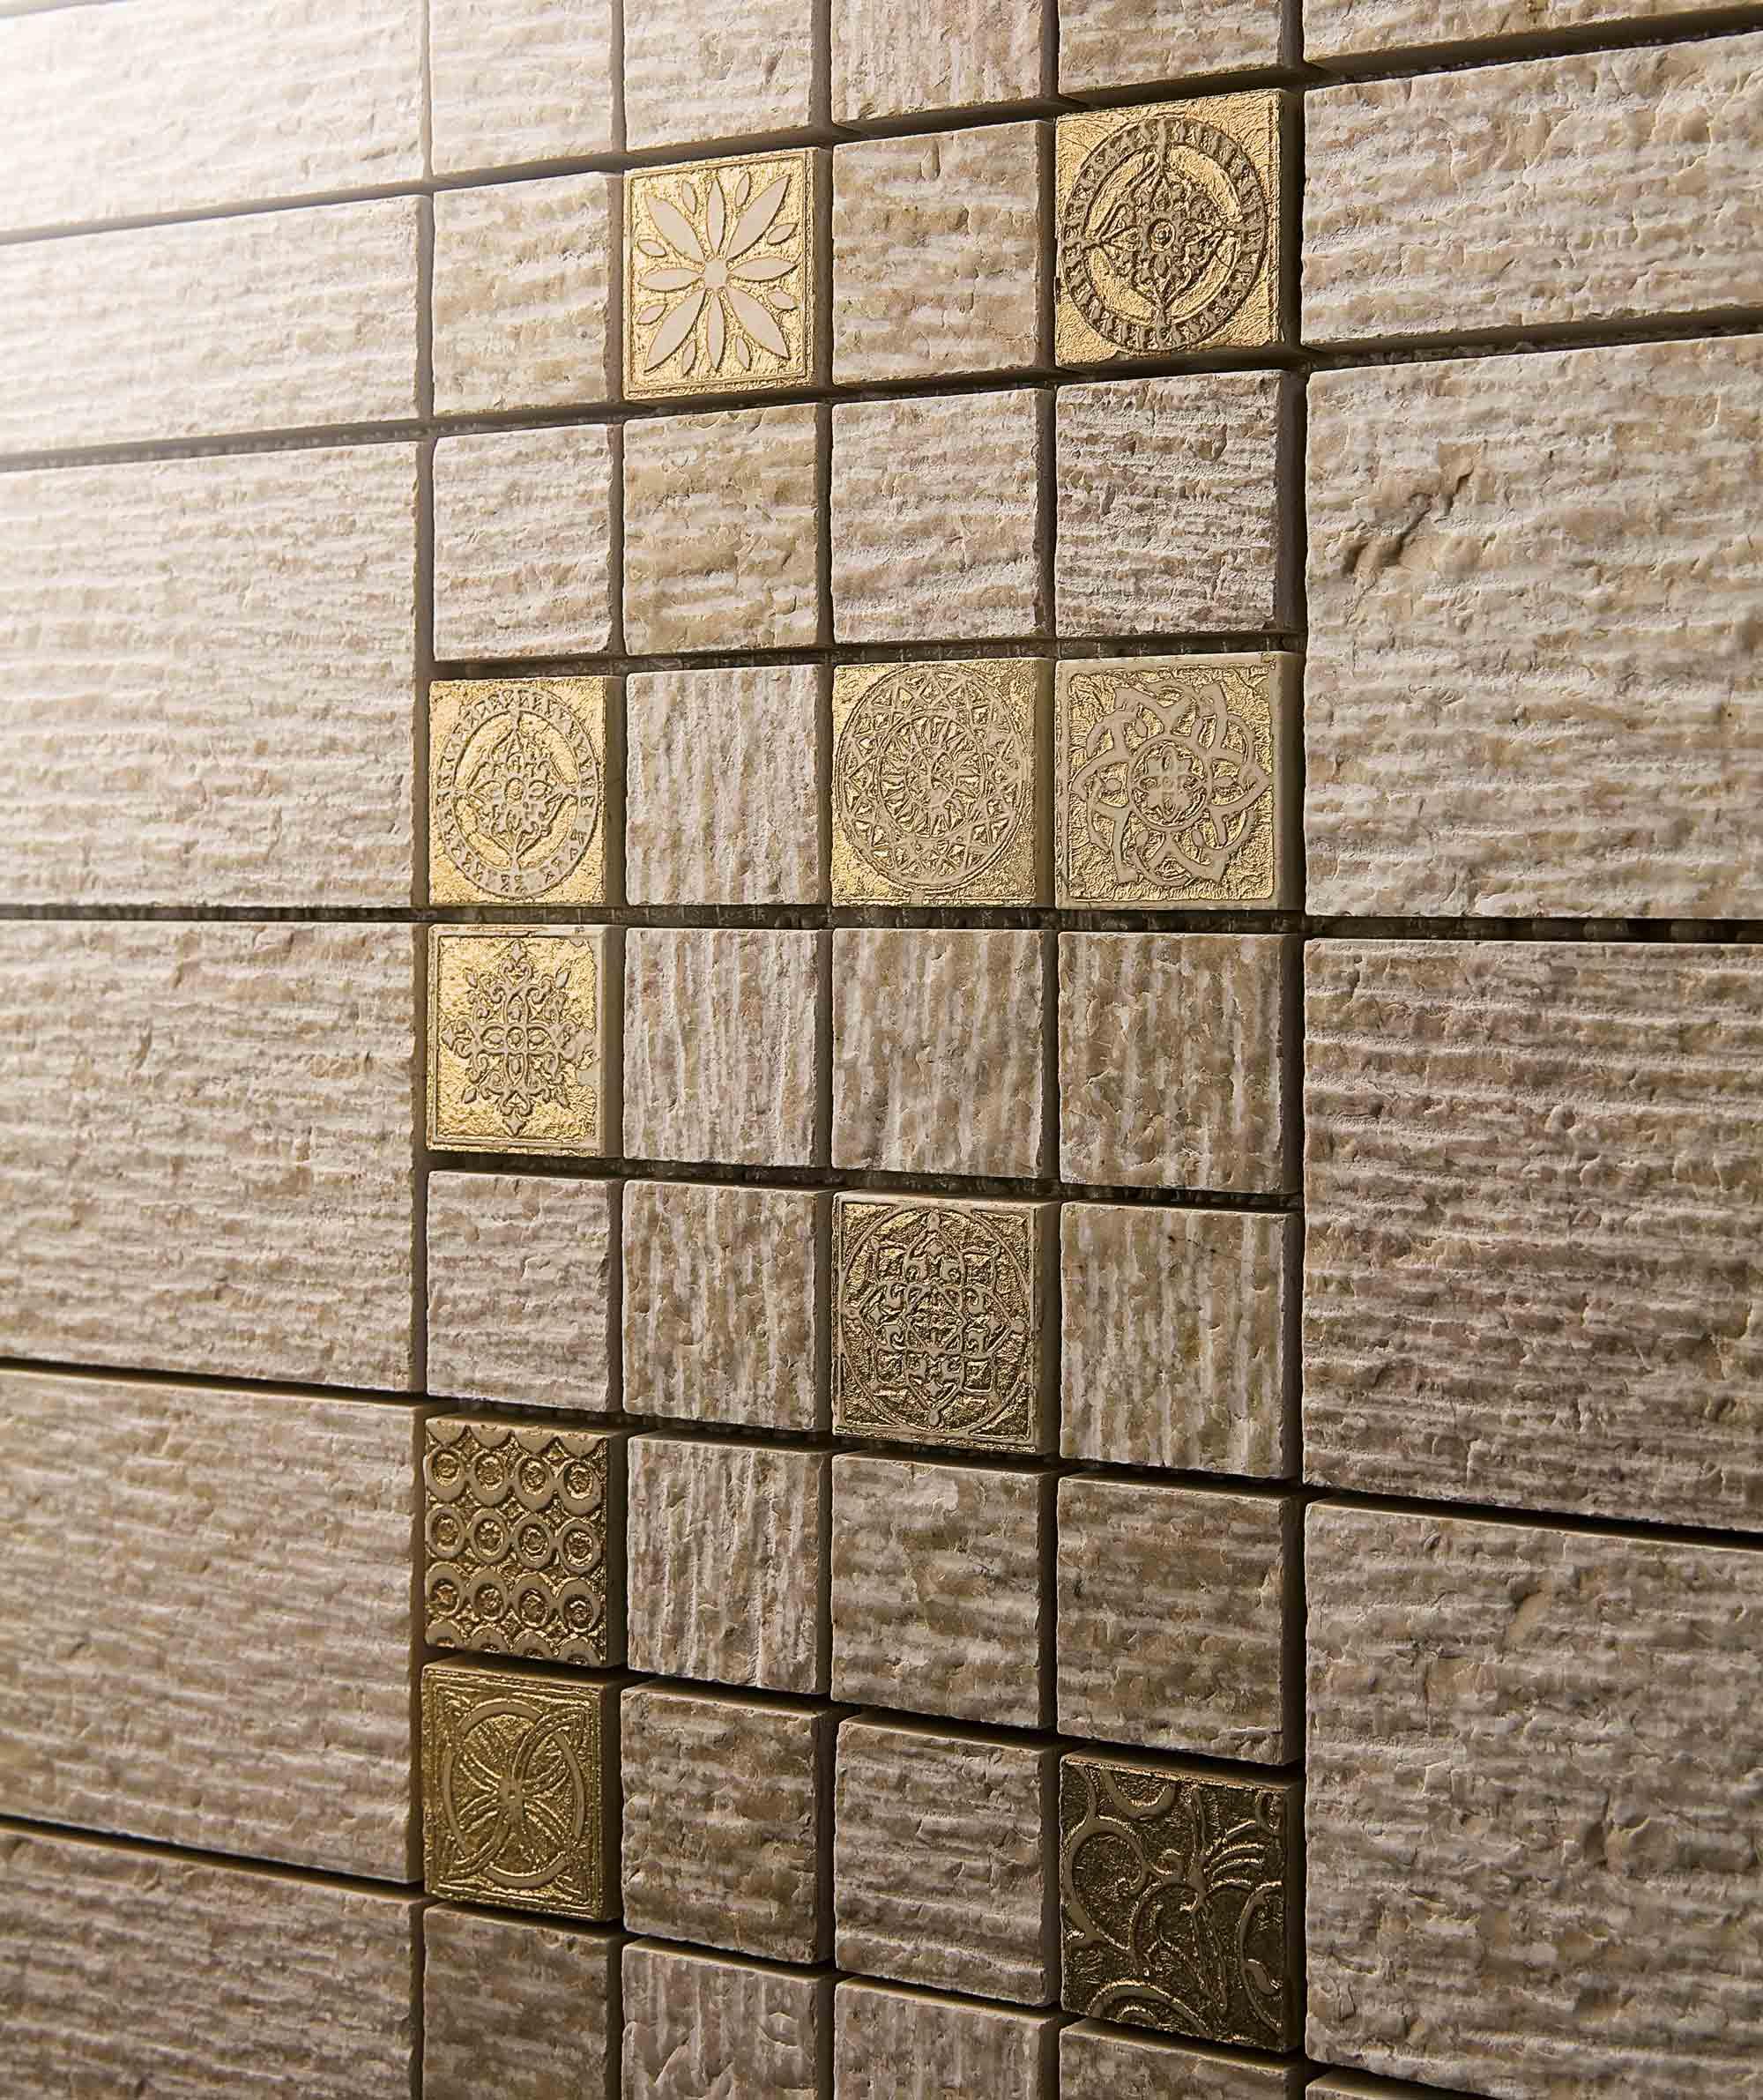 graffio Lithos mosaico italia